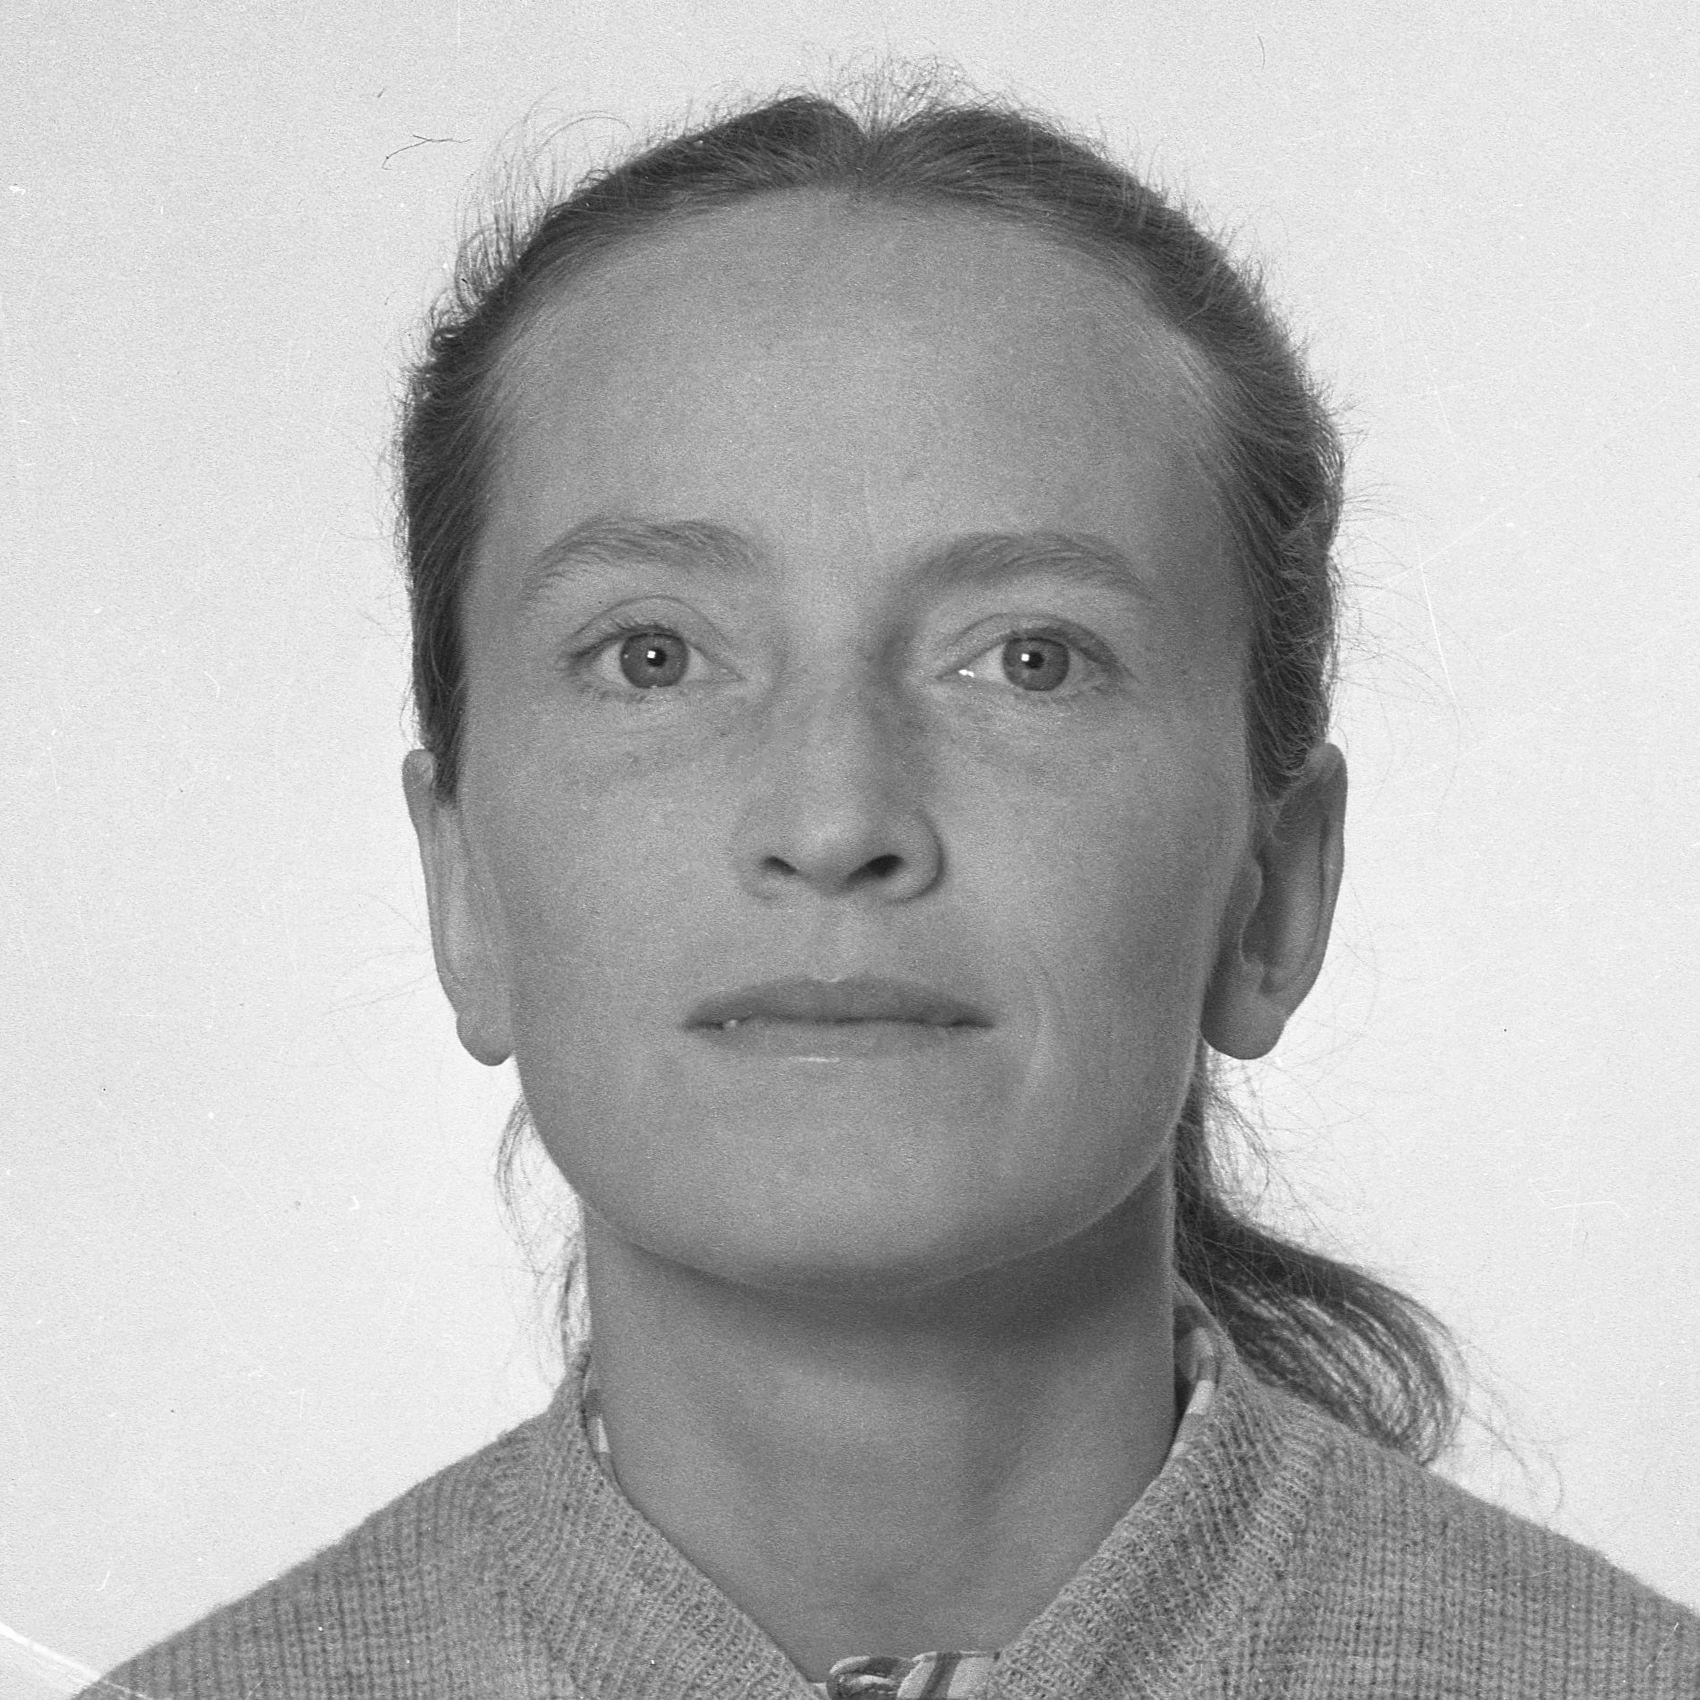 En skimrande bubbla av glas – Ingeborg Lundin (2018)